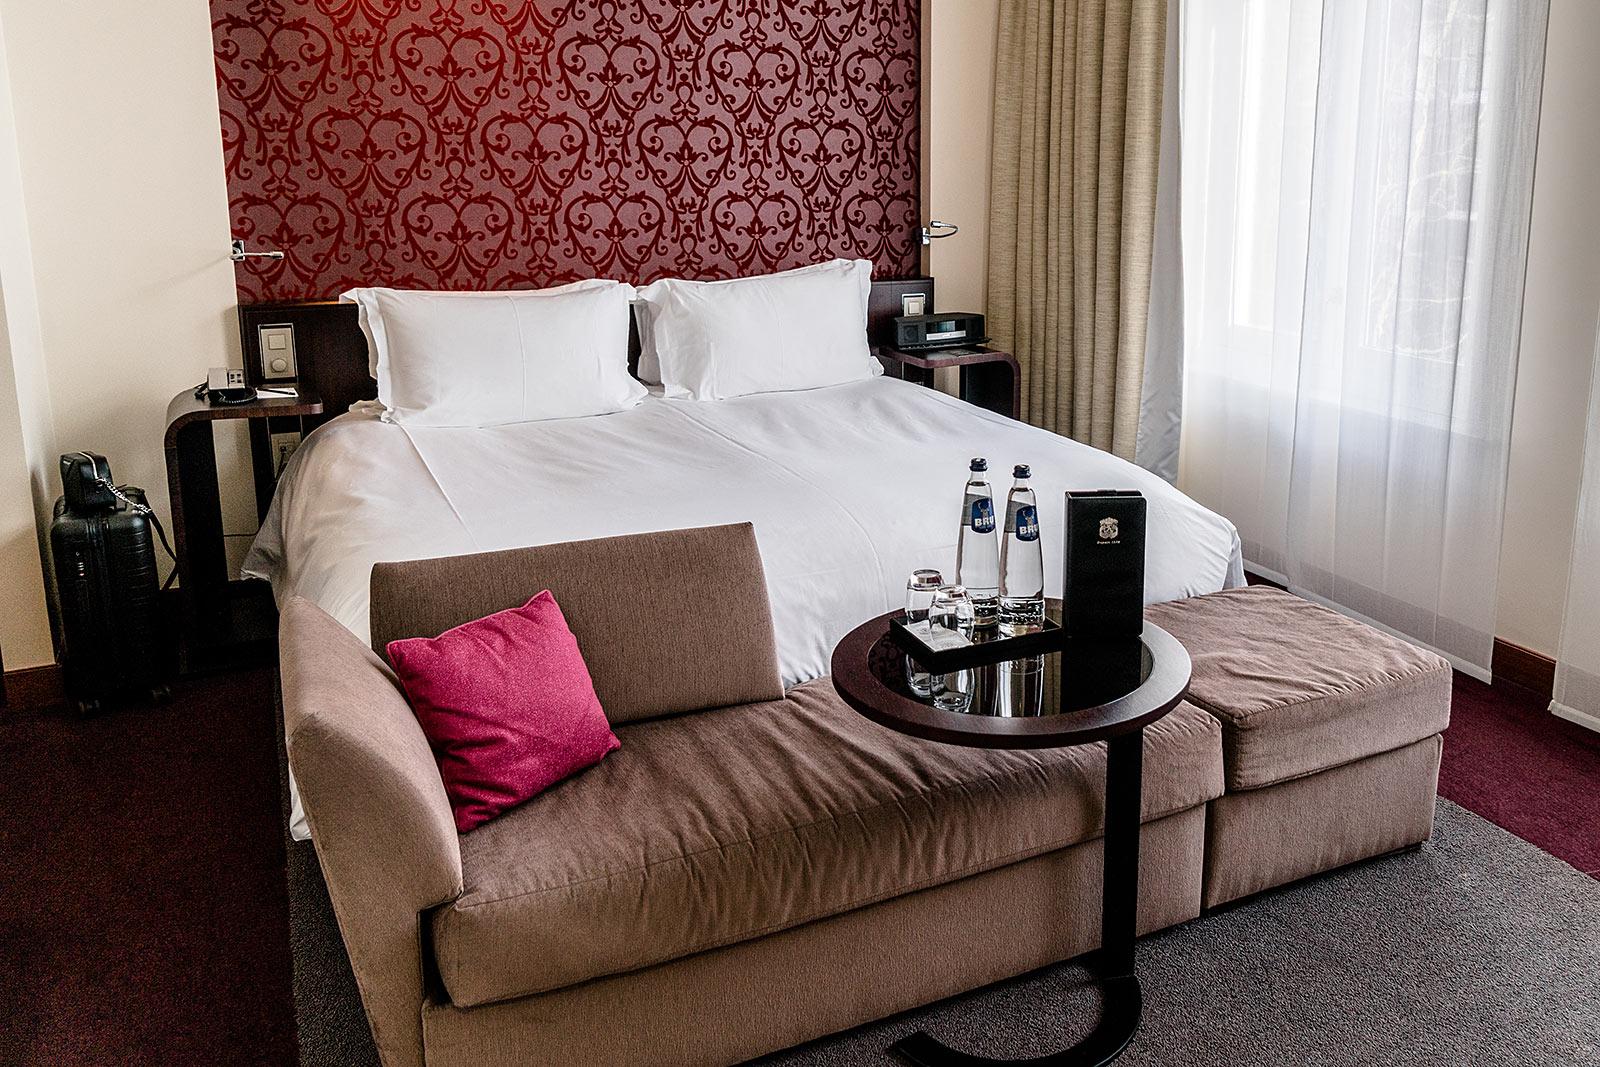 hotel amsterdam sofitel the grand bett travel blog sunnyinga